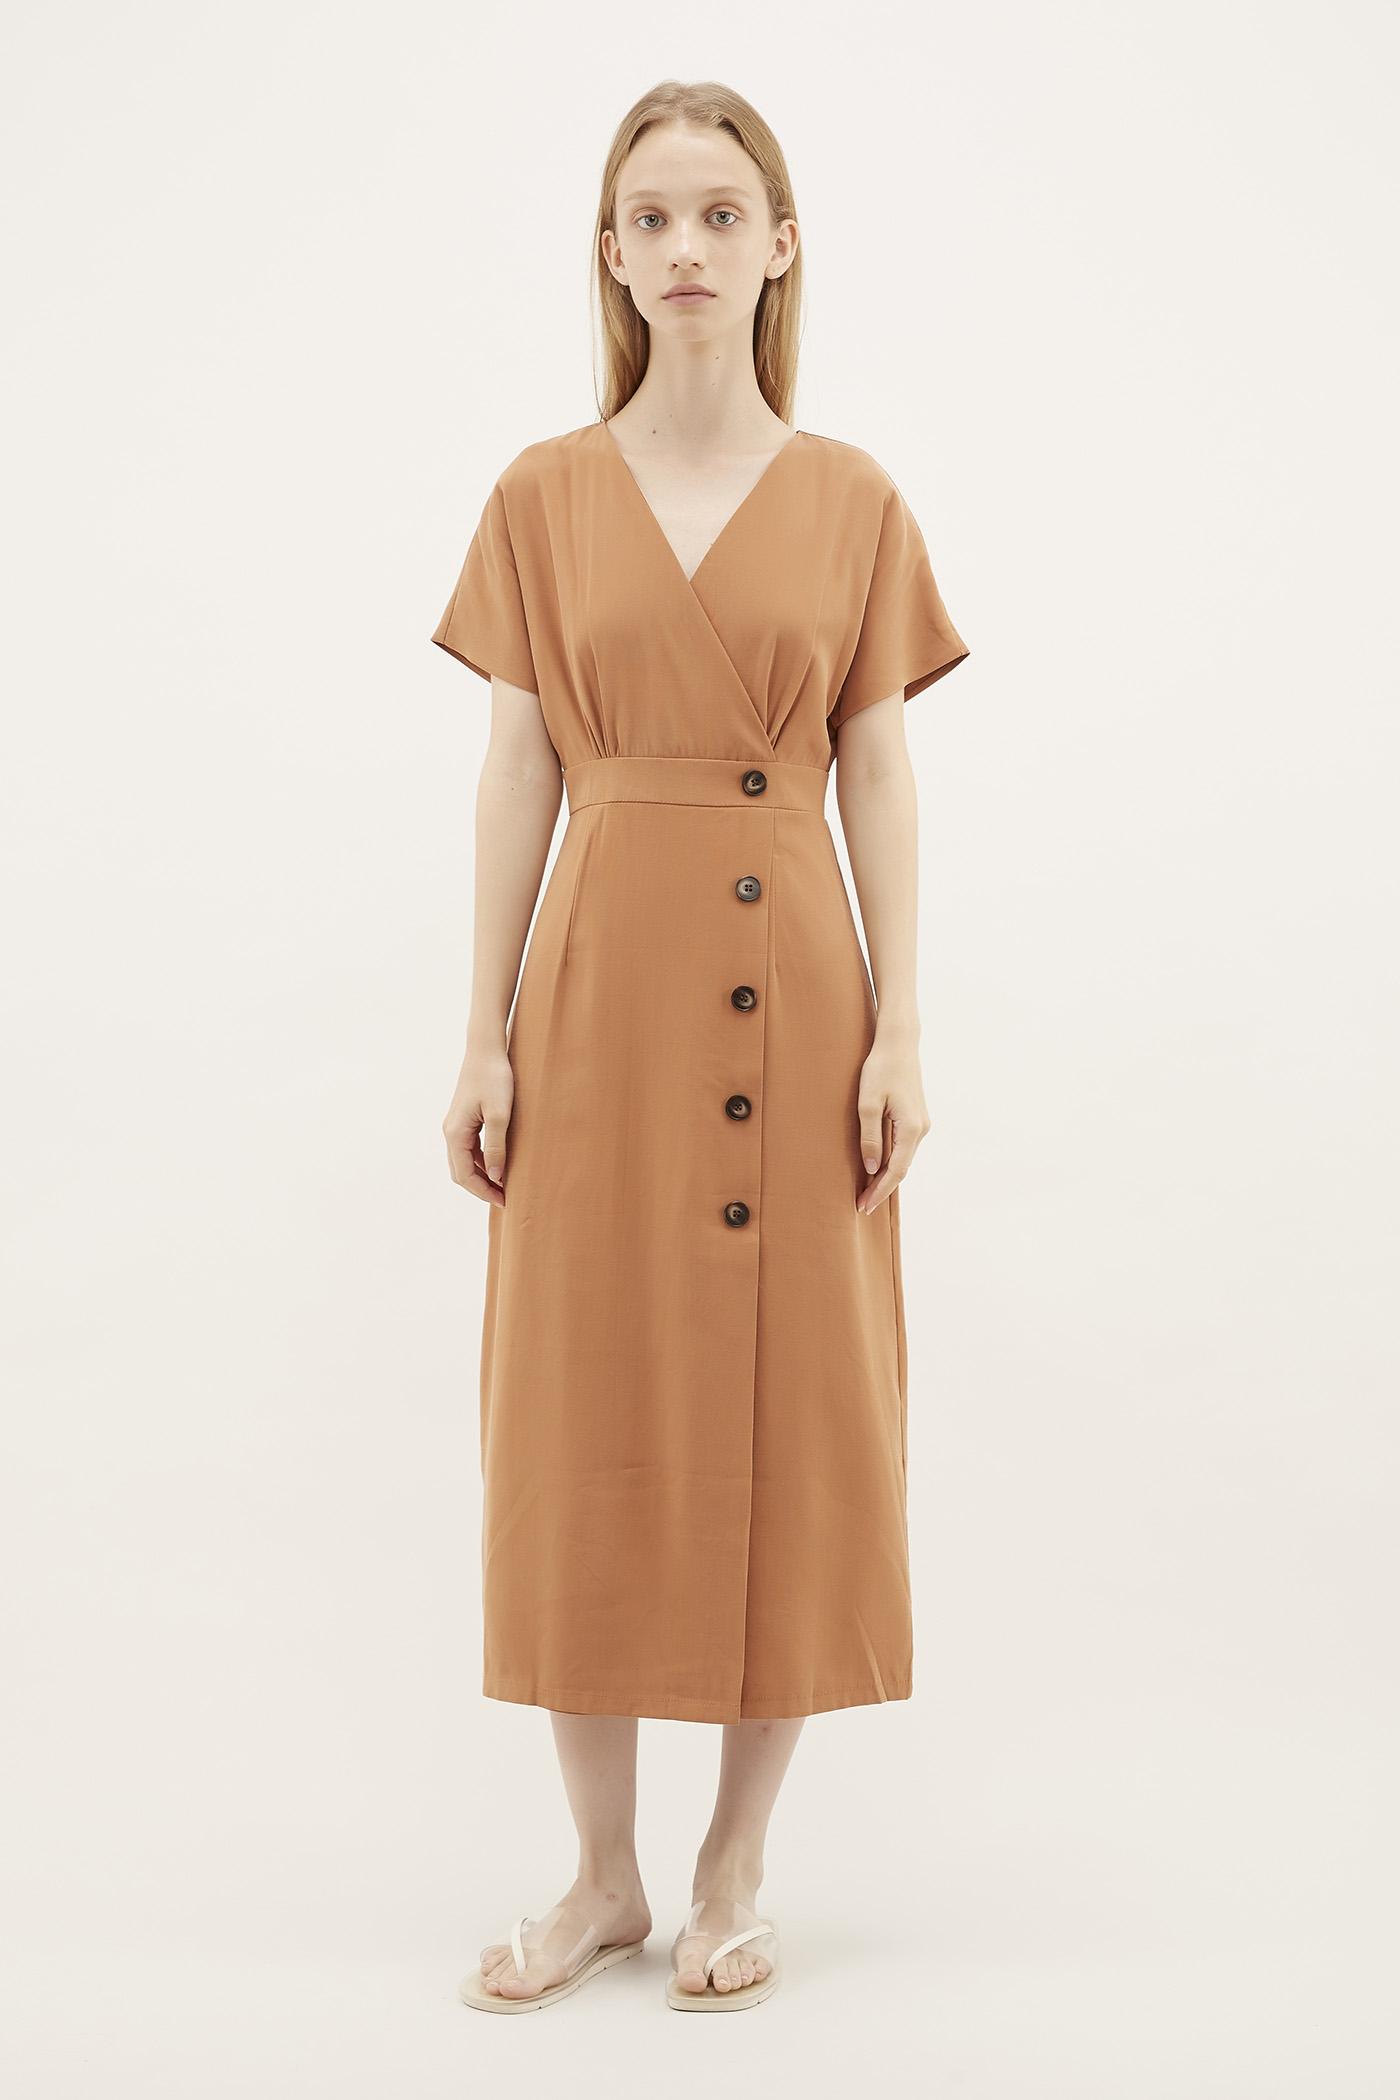 Poli Overlap Dress